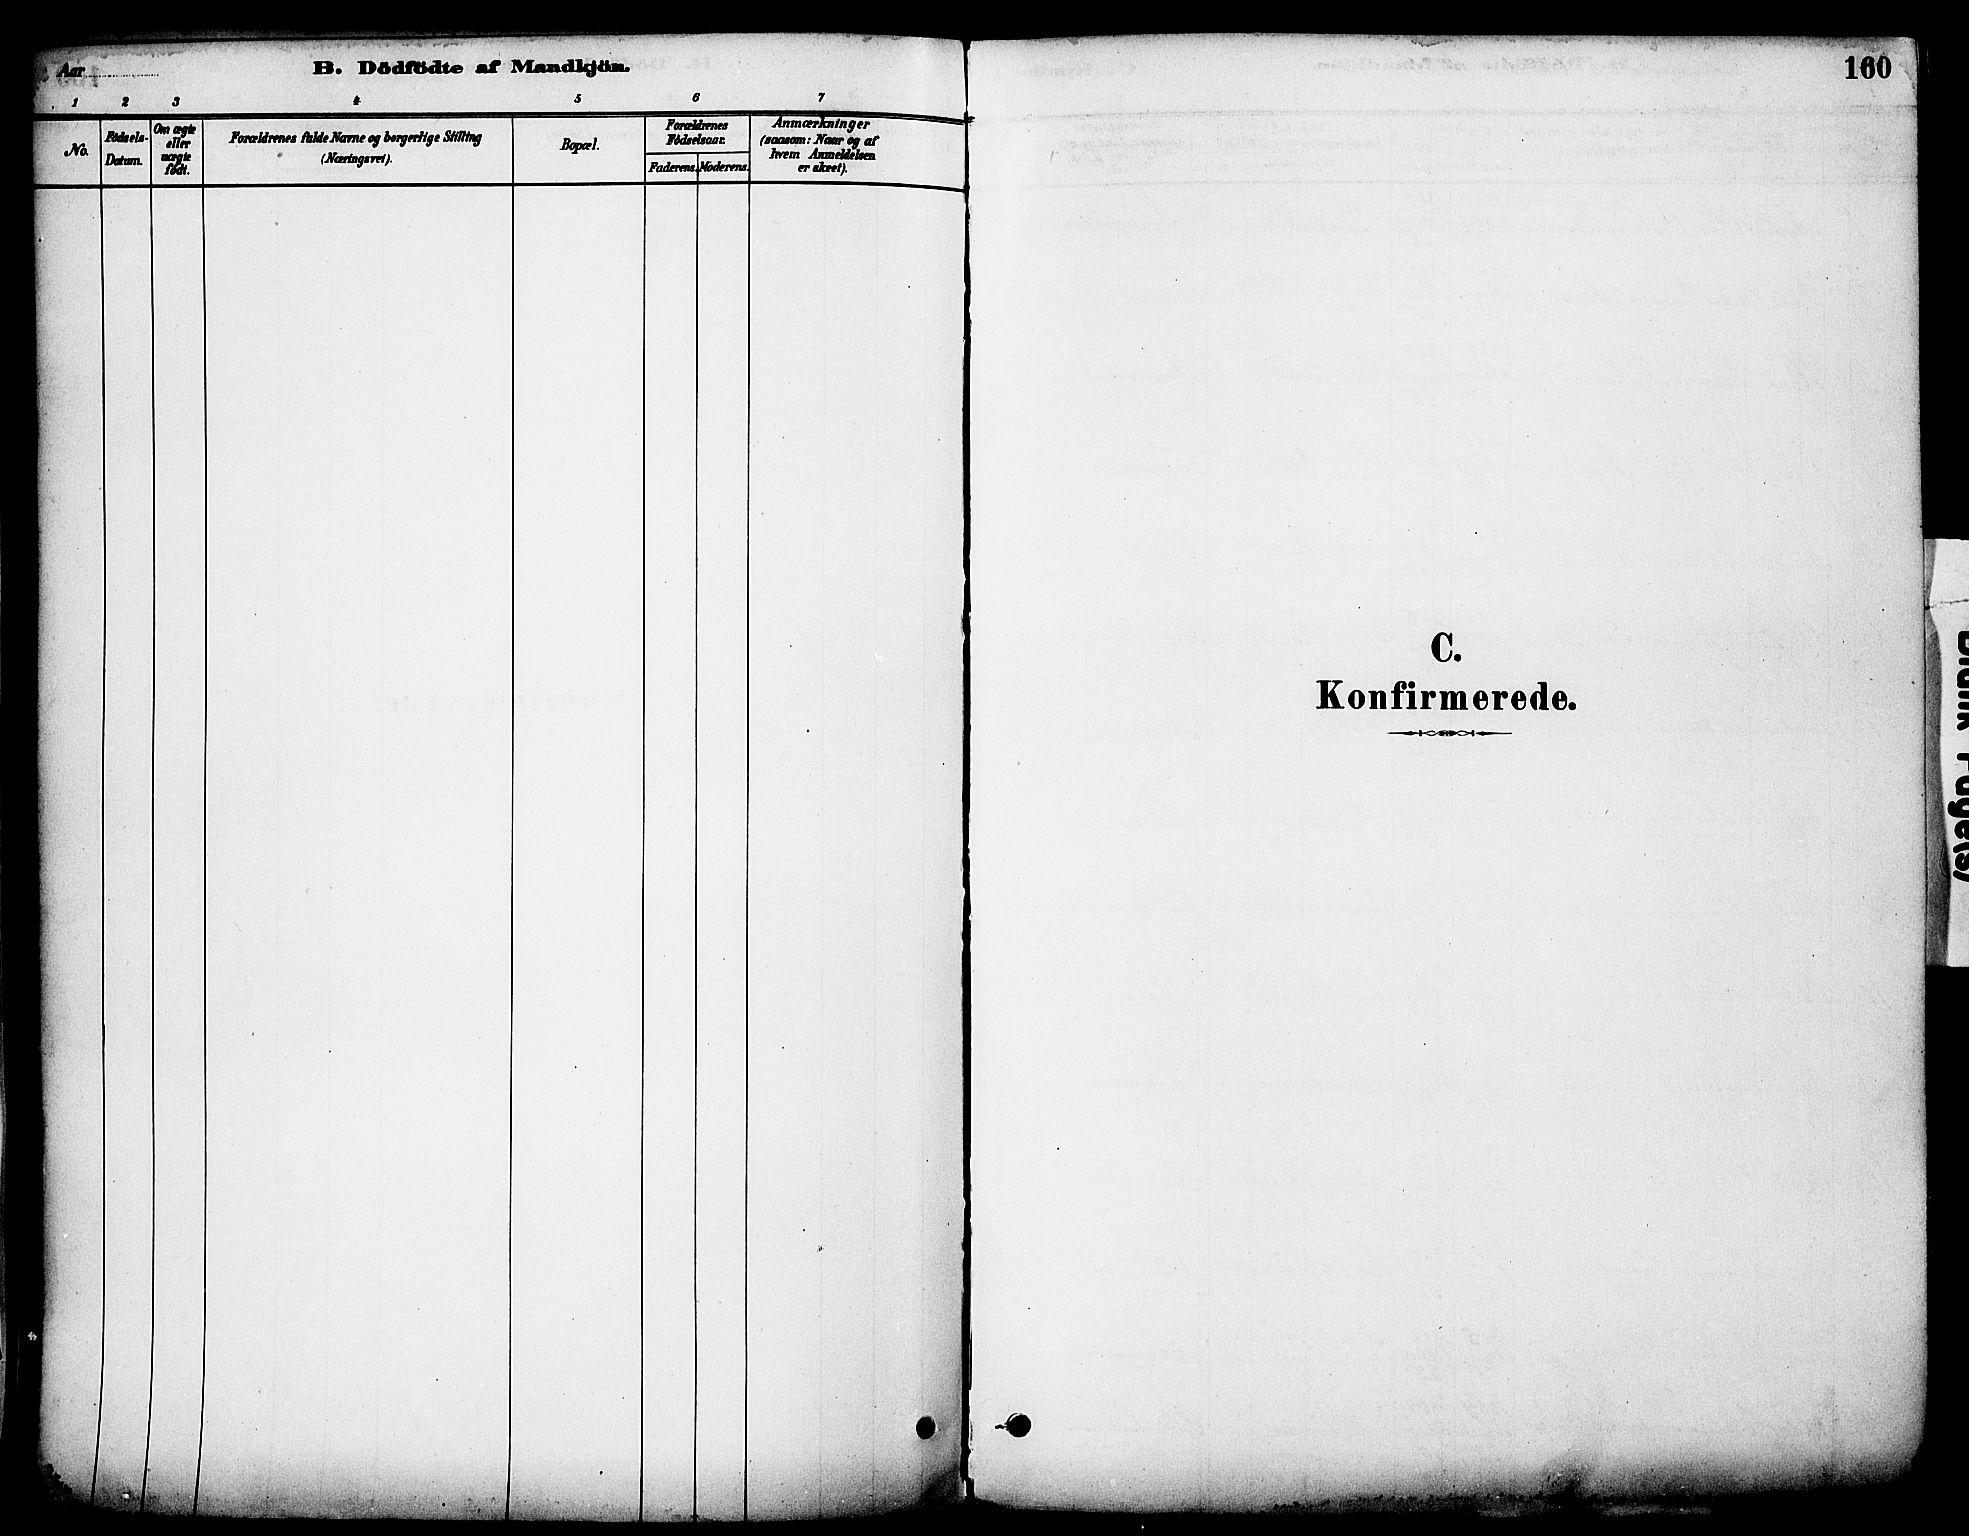 SAH, Stange prestekontor, K/L0017: Ministerialbok nr. 17, 1880-1893, s. 160